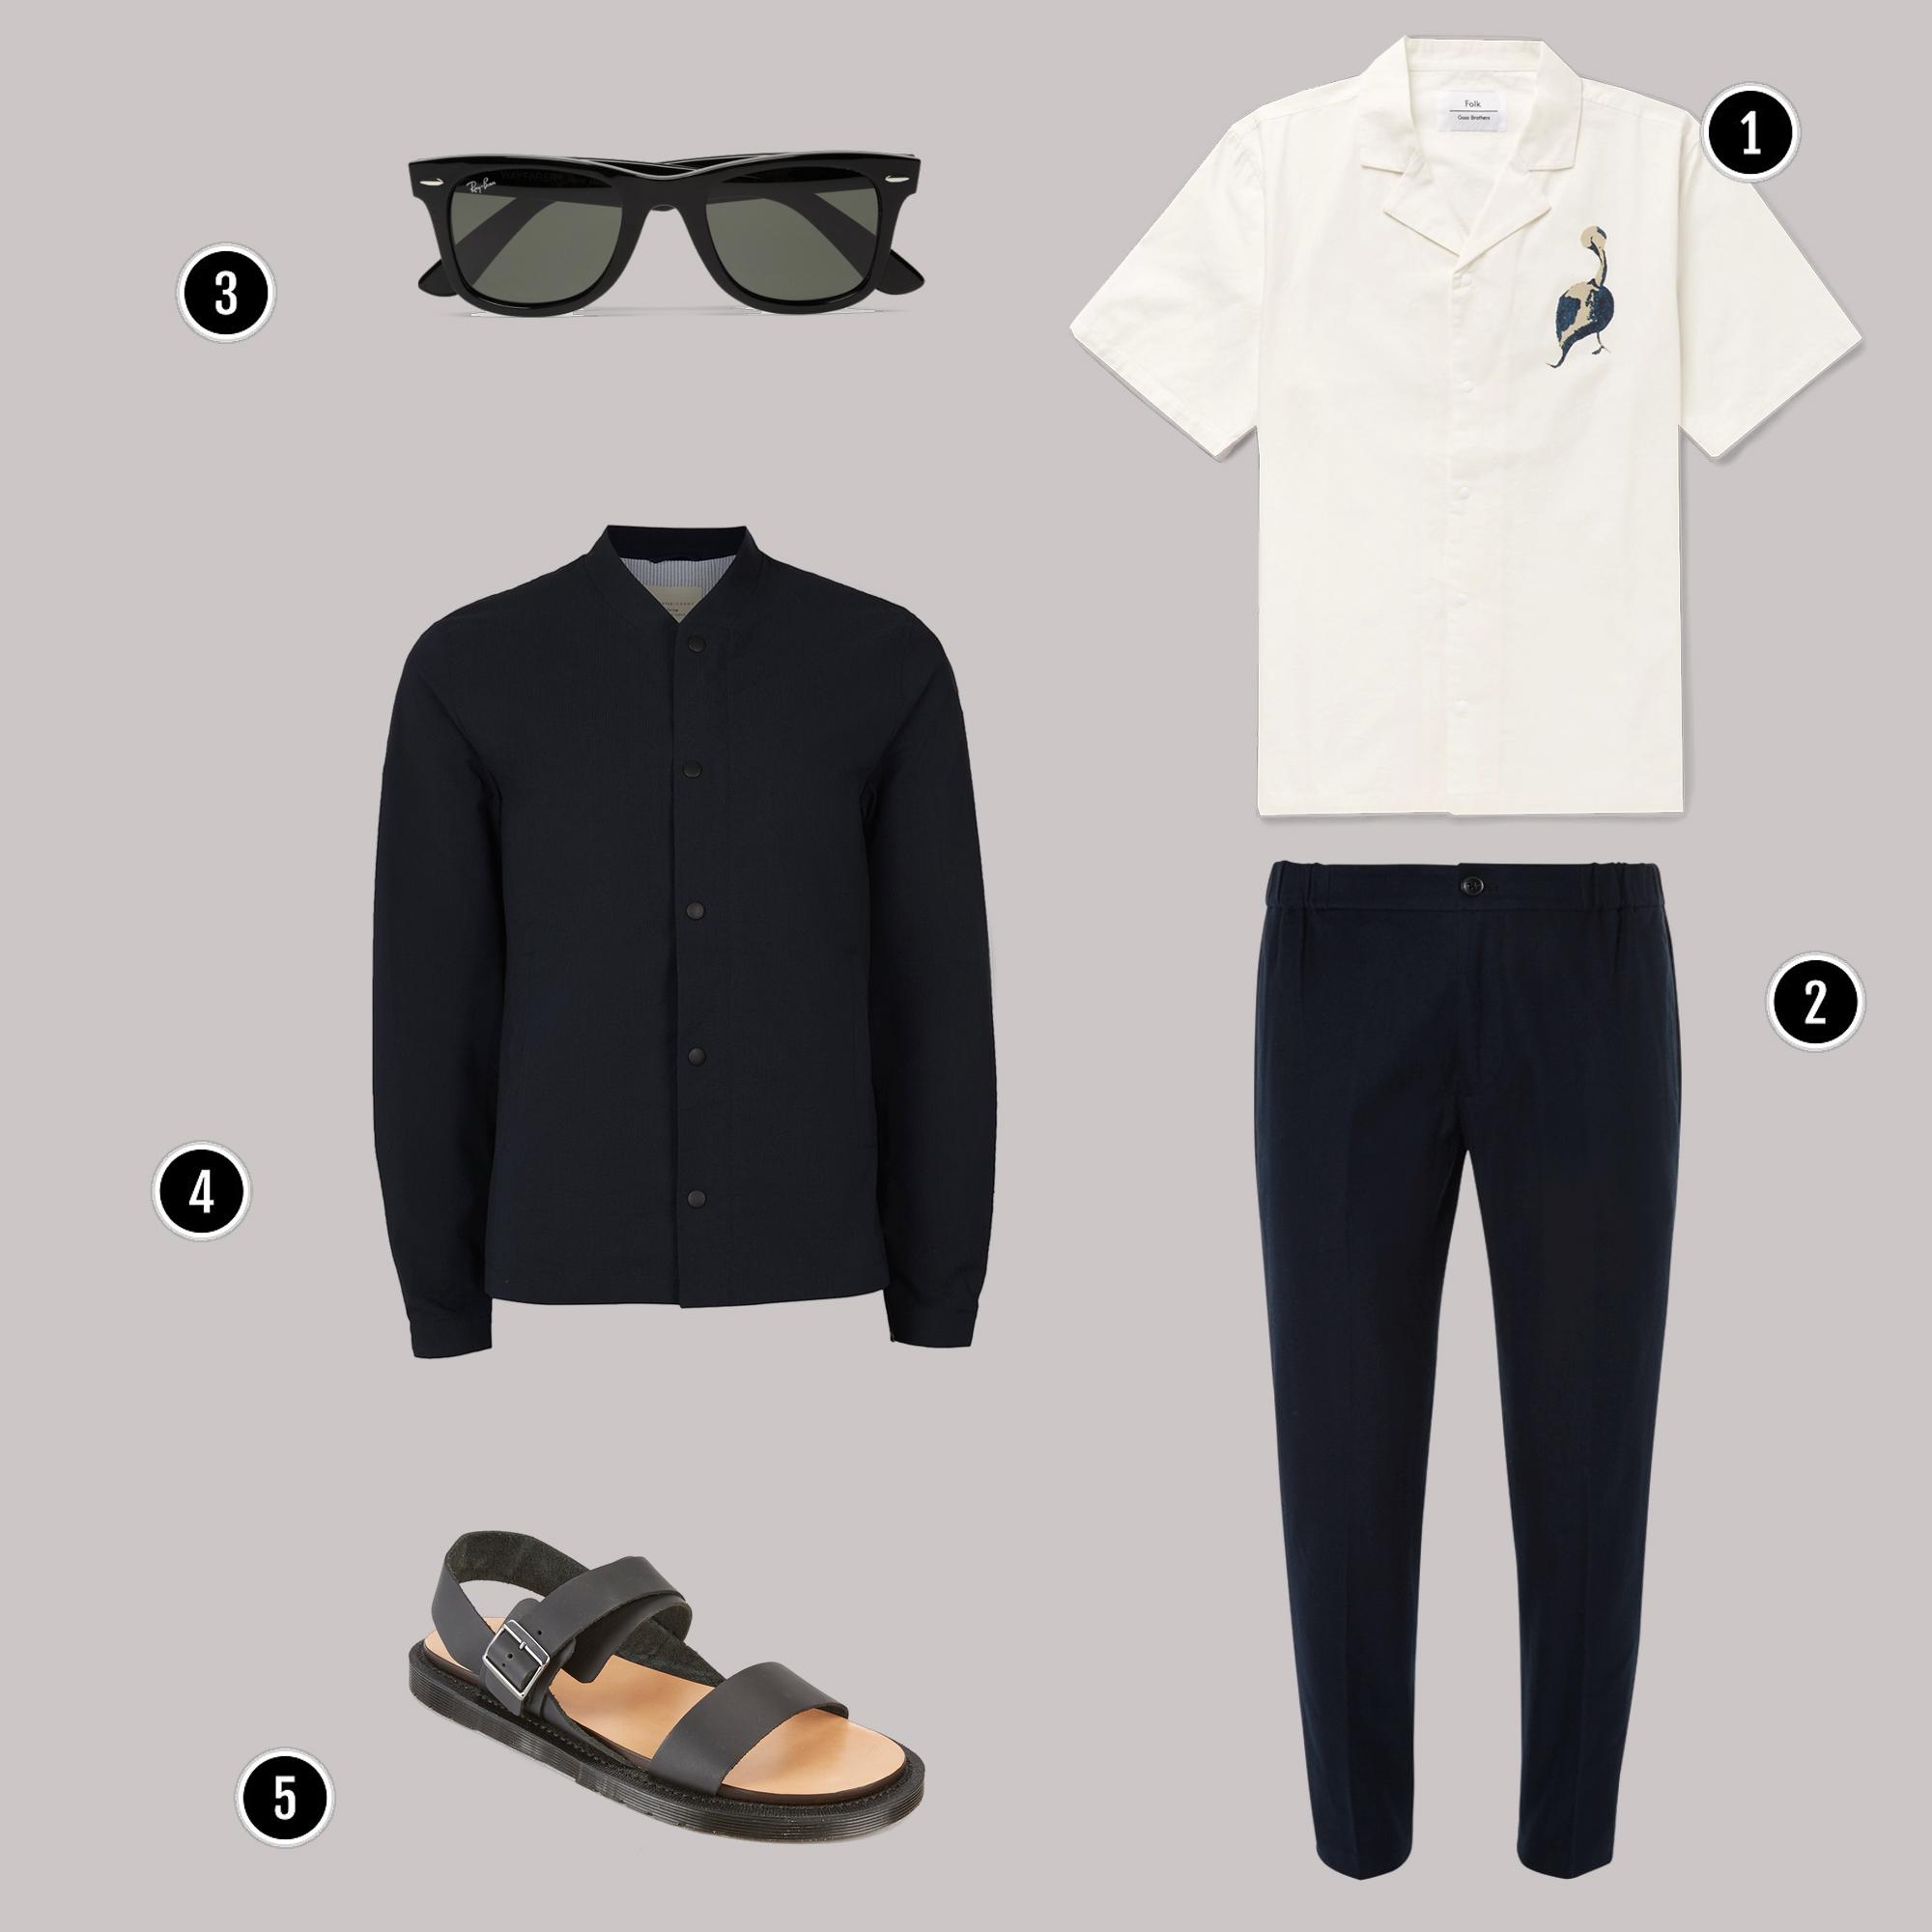 1. Áo: Folk/ 2. Quần: Club Monaco/ 3. Kính: Rayban / 4. Áo: Selected Homme / 5. Giày: Dr martens